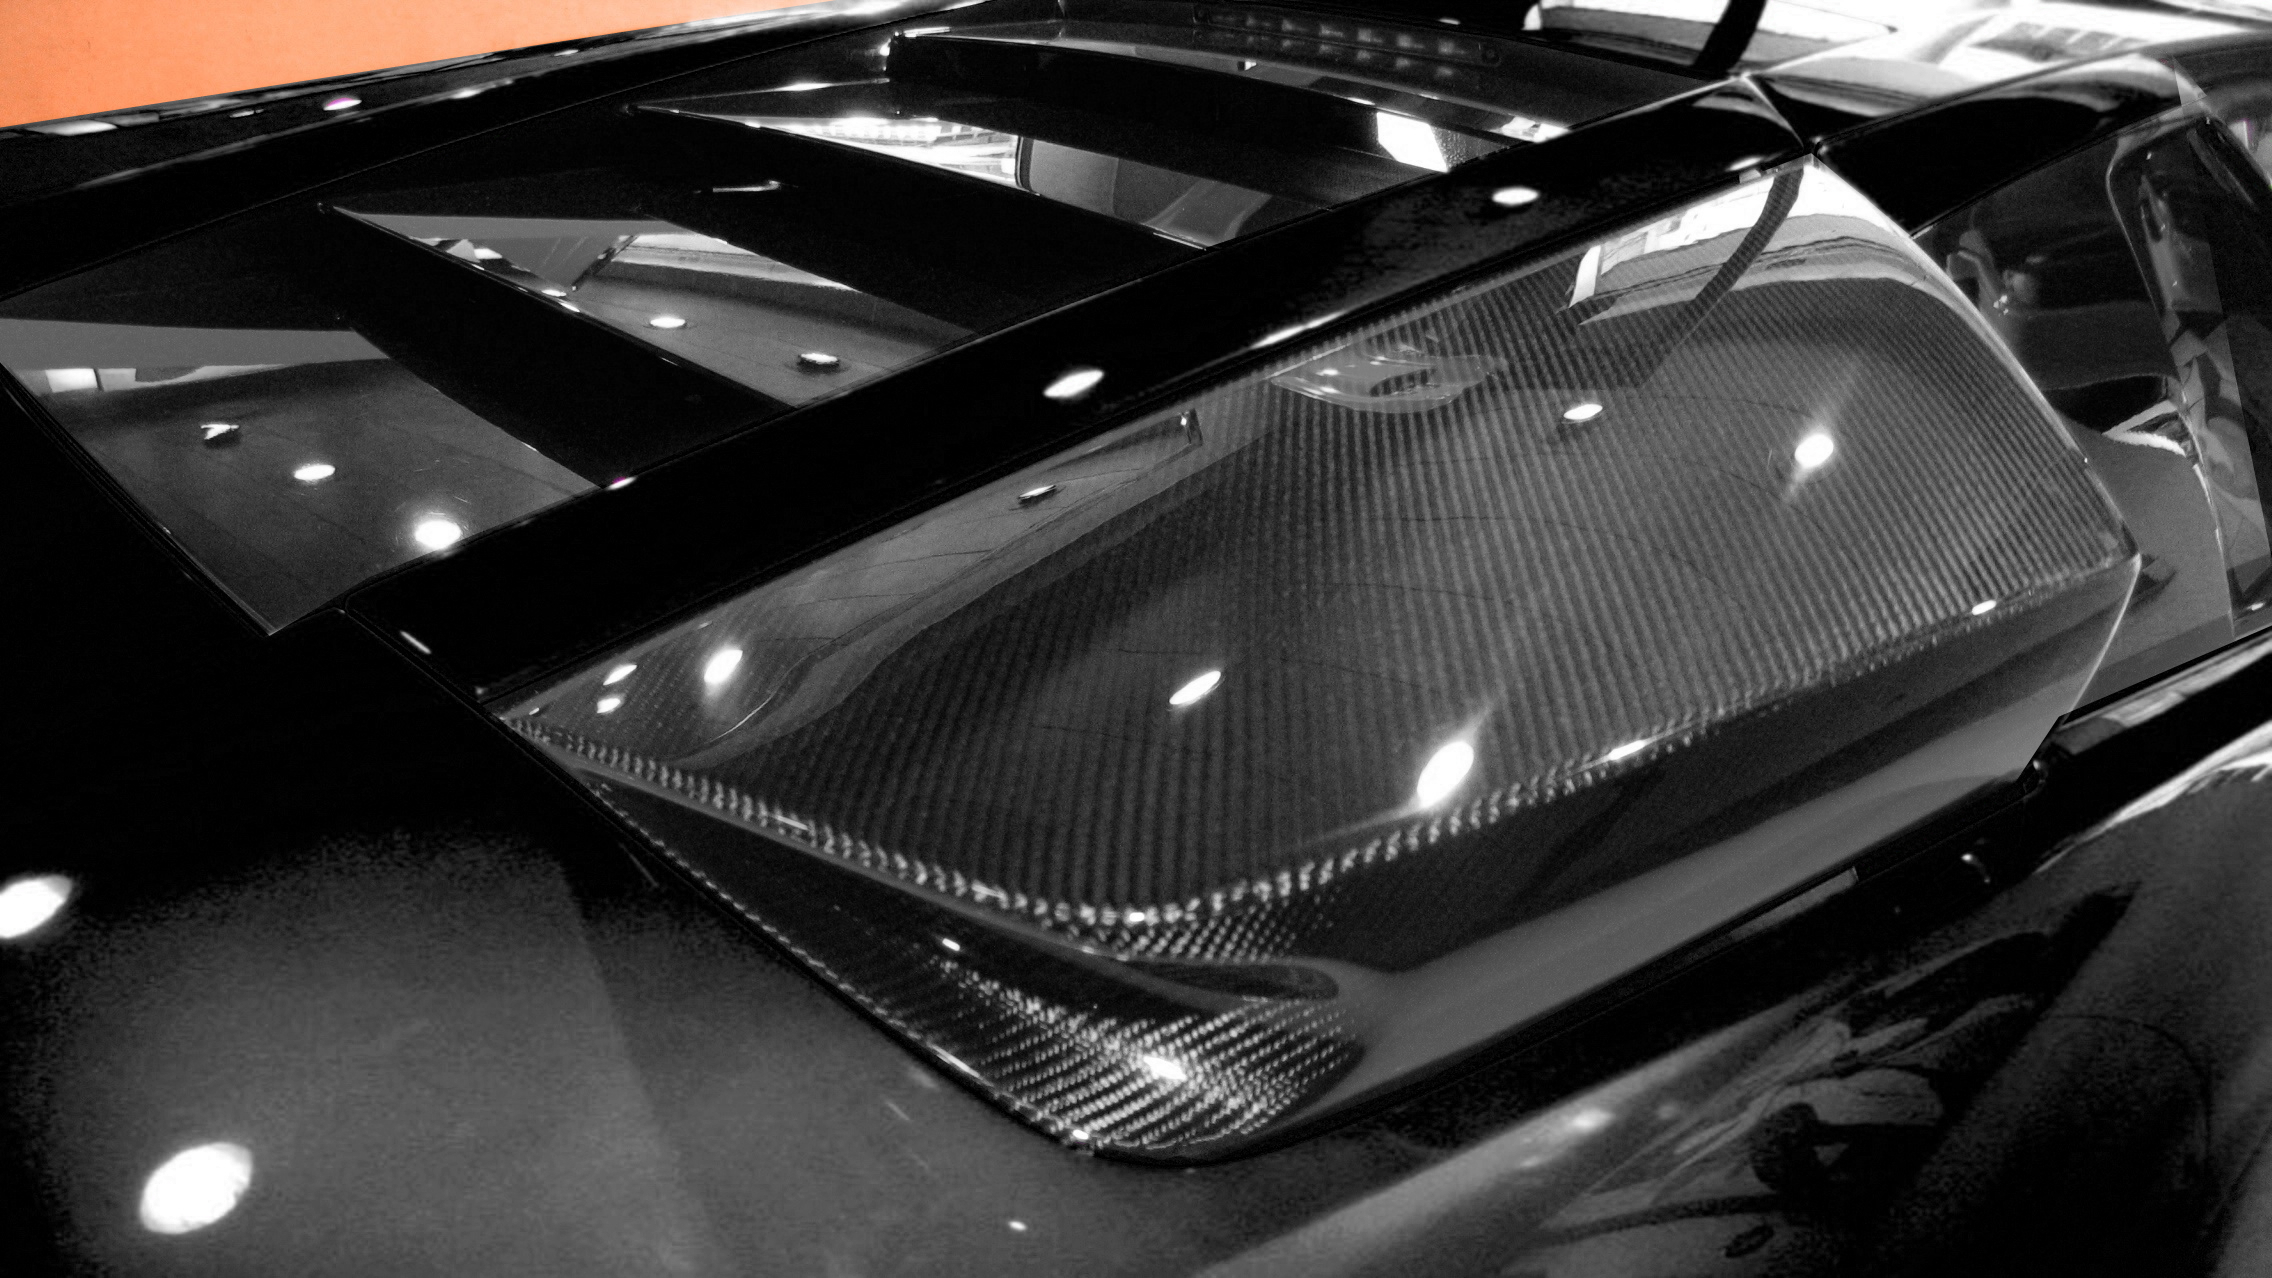 Dmc 2011 Gt Carbon Fiber Body Kit For The Lamborghini Murcielago 2011gt